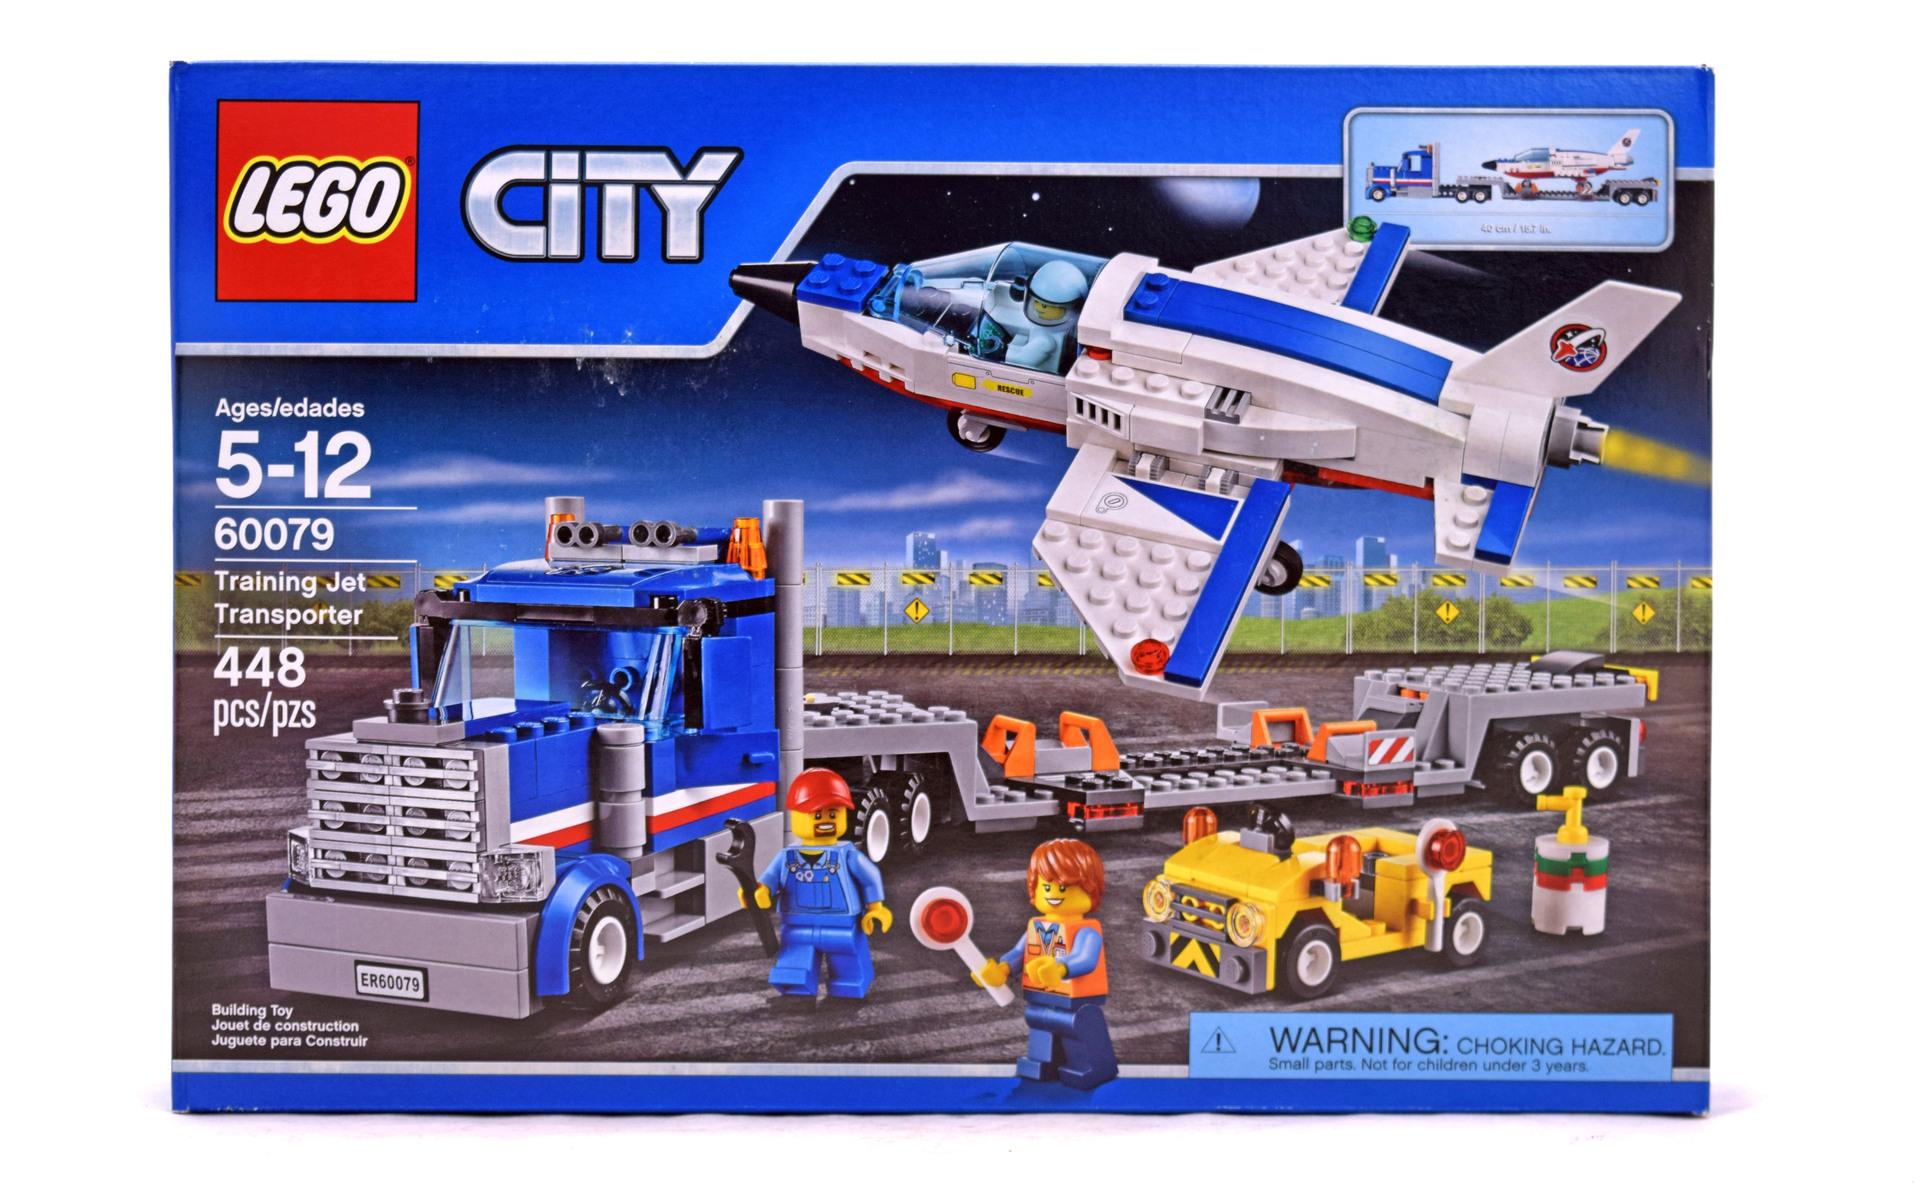 Horizon Express - LEGO set #10233-1 (NISB) (Building Sets